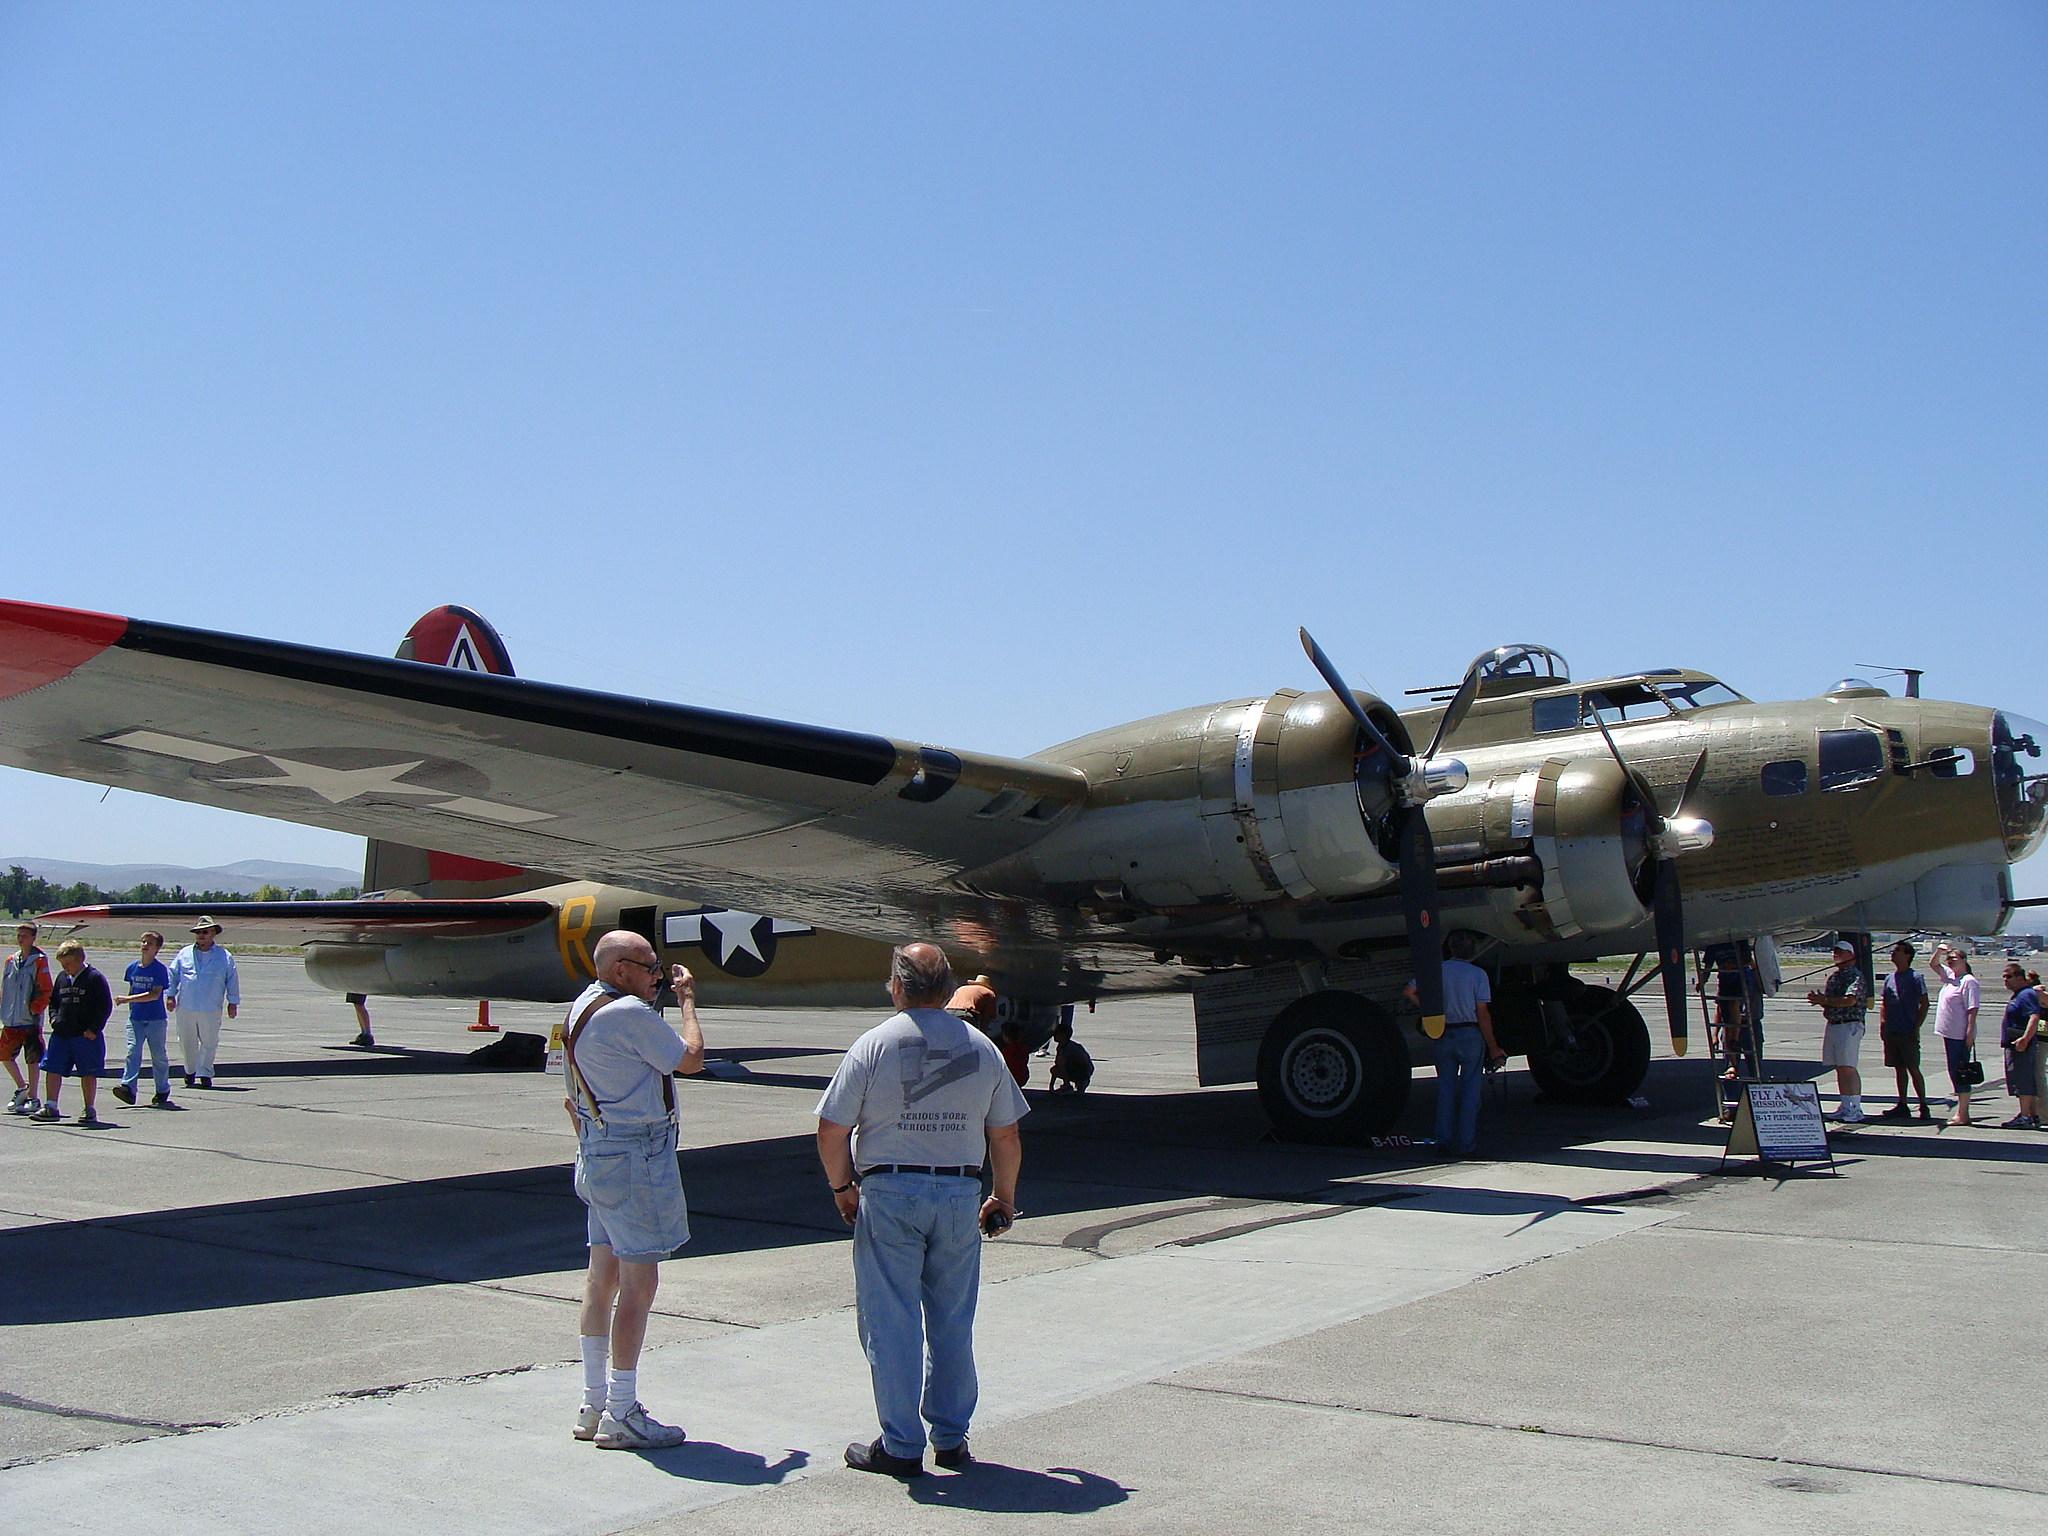 B-17 at Bergstrom Aircraft